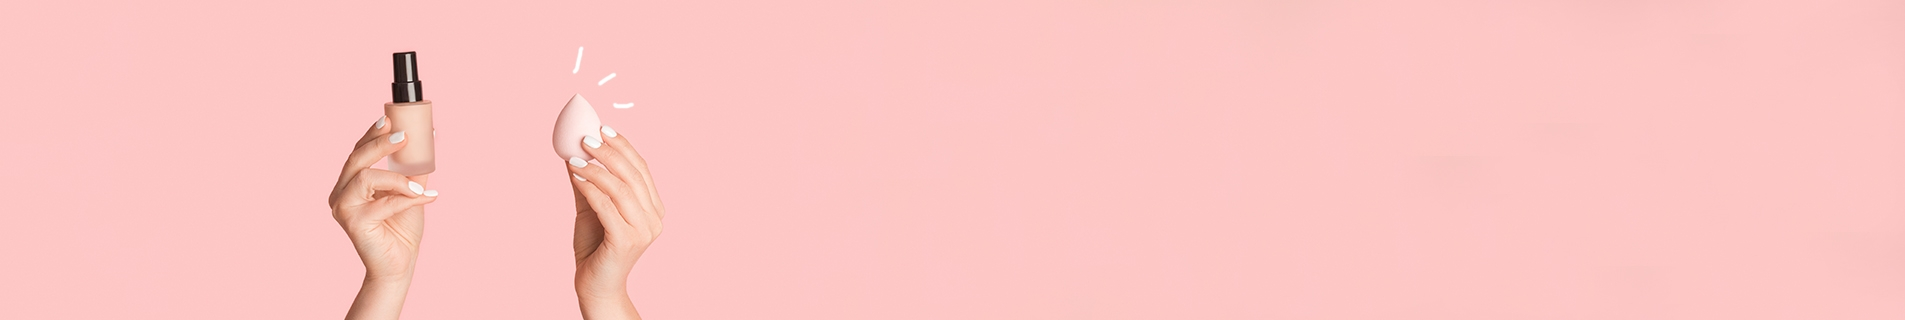 Tendance maquillage nude |SAGA Cosmetics